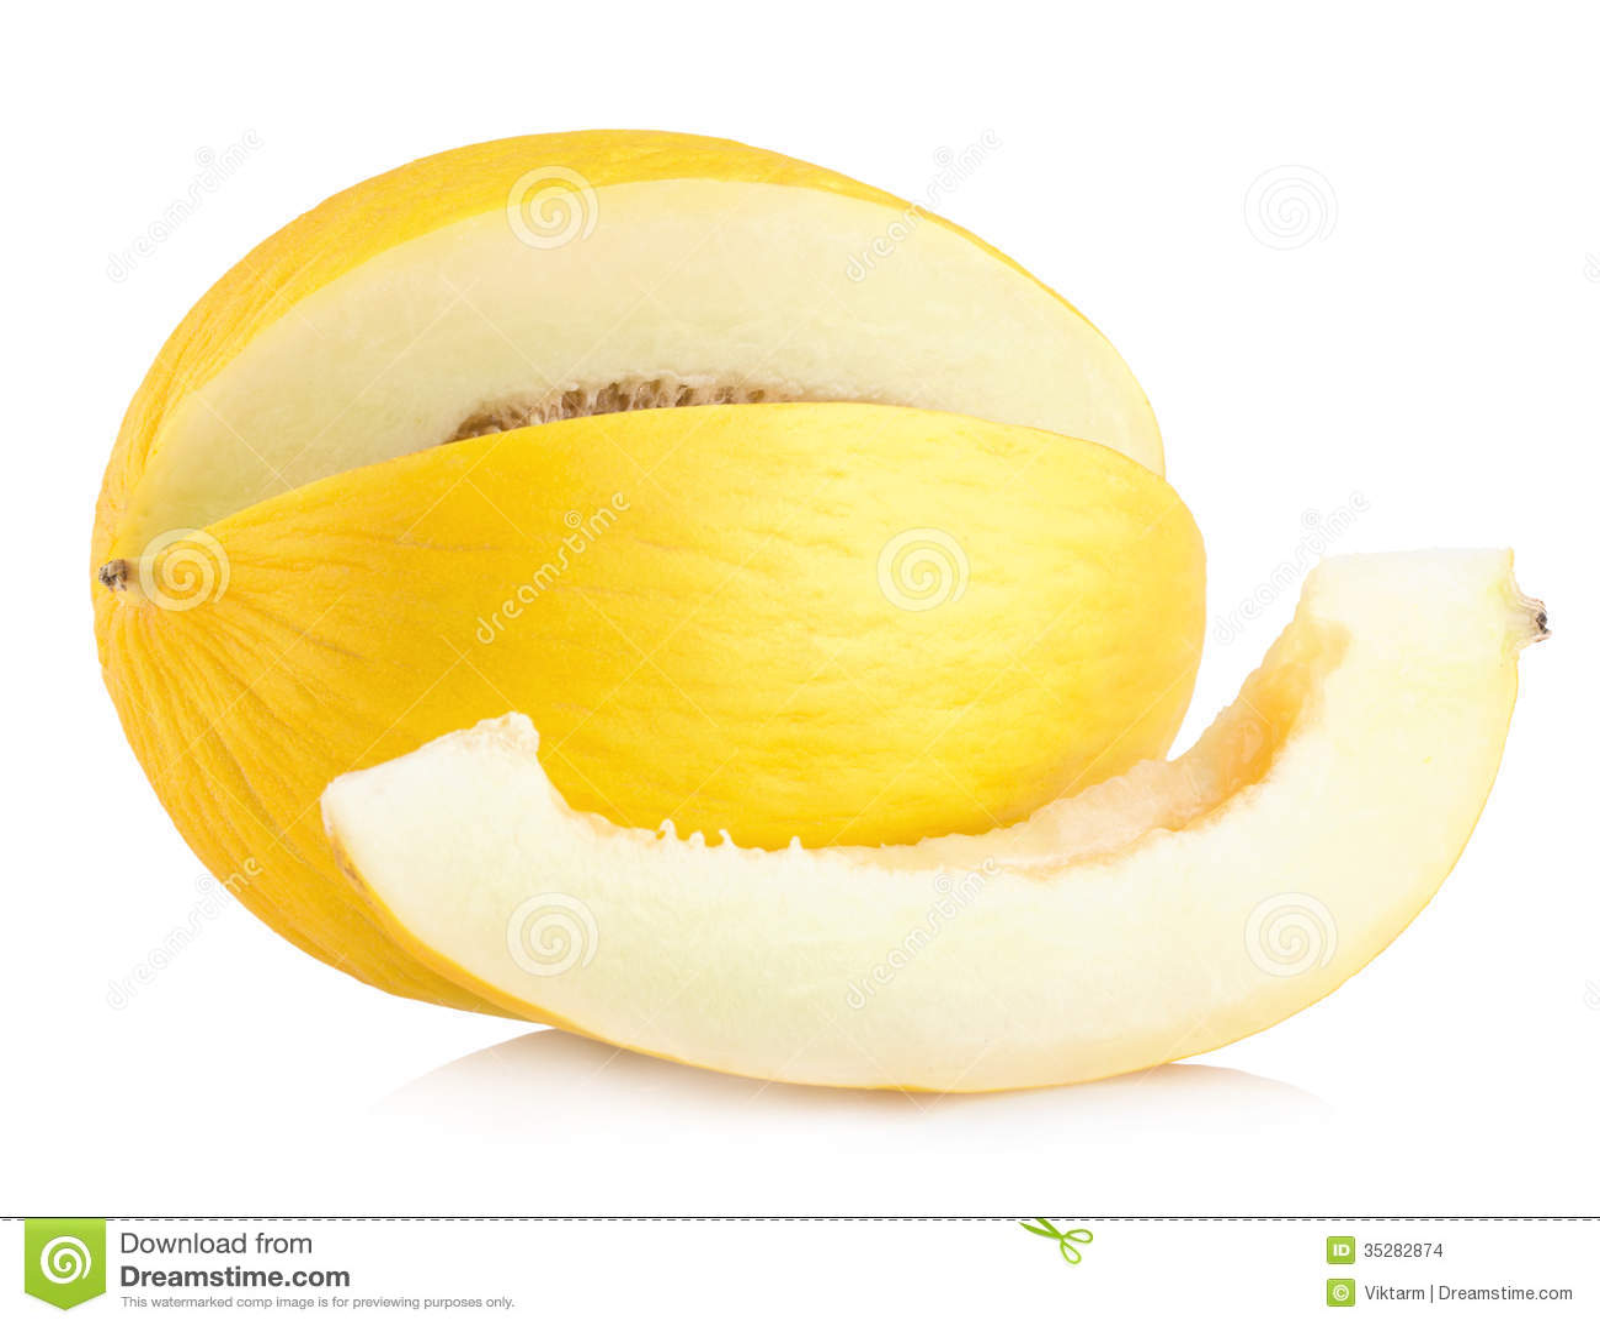 Honeydew Melon Stock Images - Image: 35282874